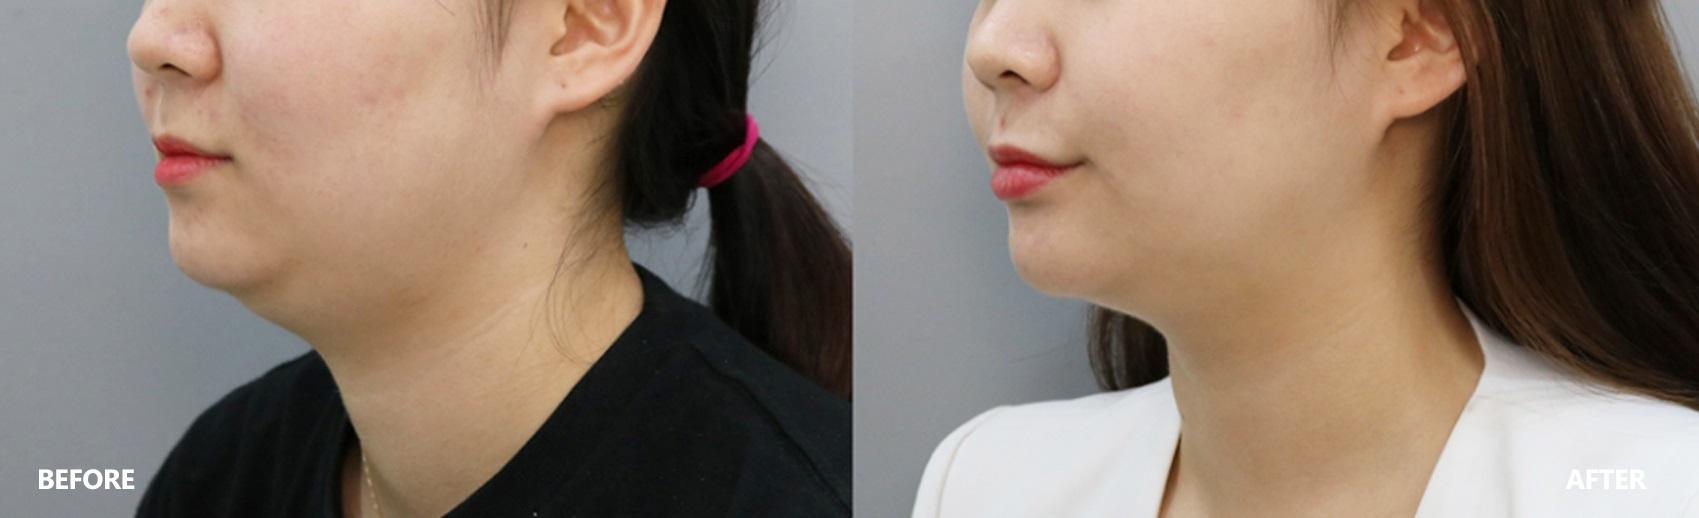 skin-lifting-result-2